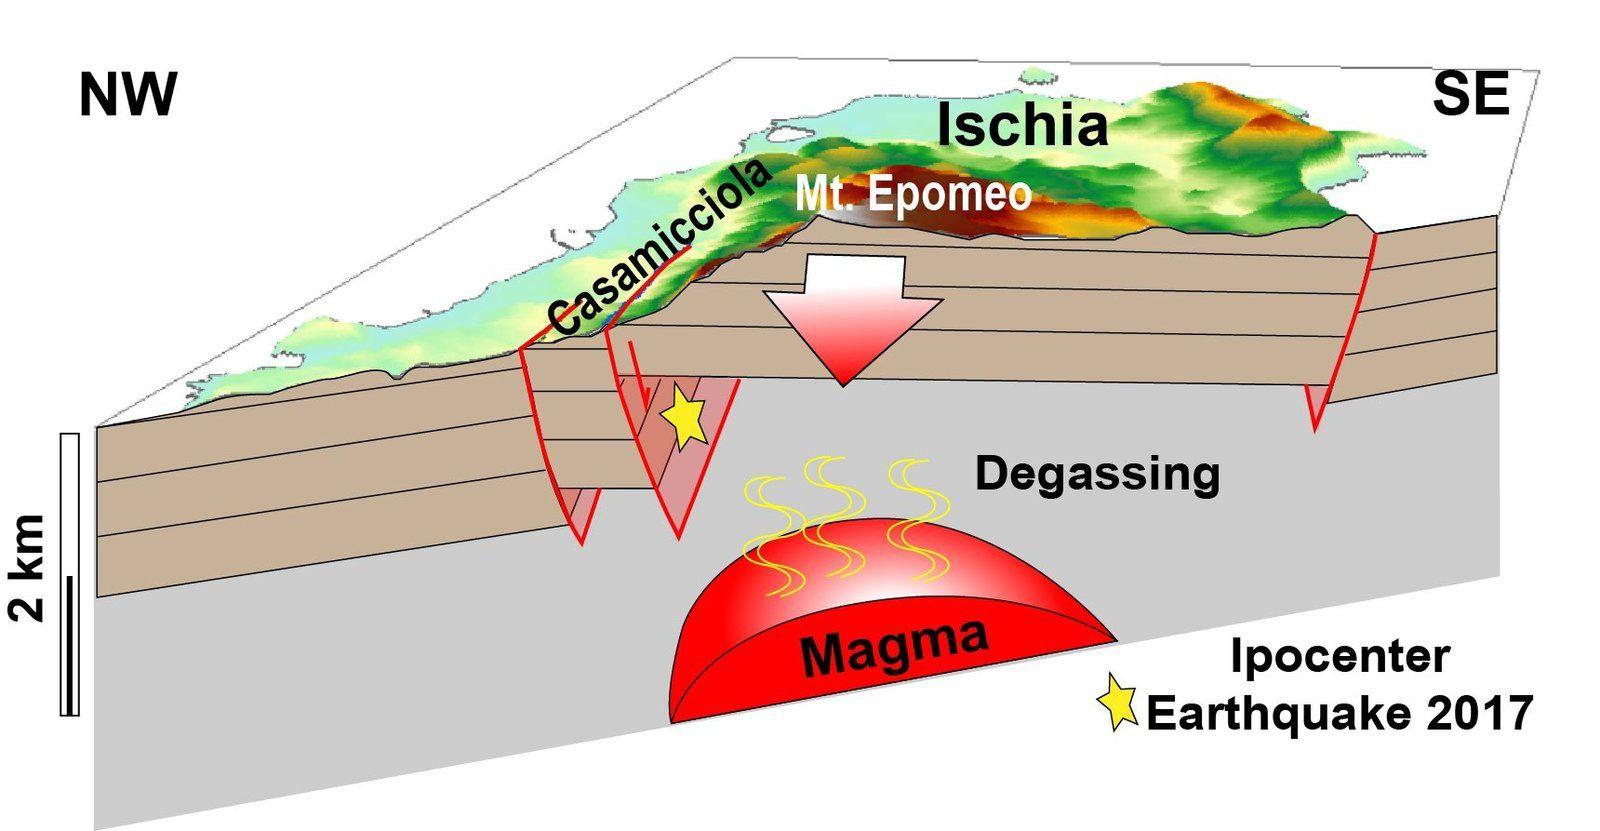 Ischia 2019 - schéma explicatif de la cause des séismes - via INGVvulcani